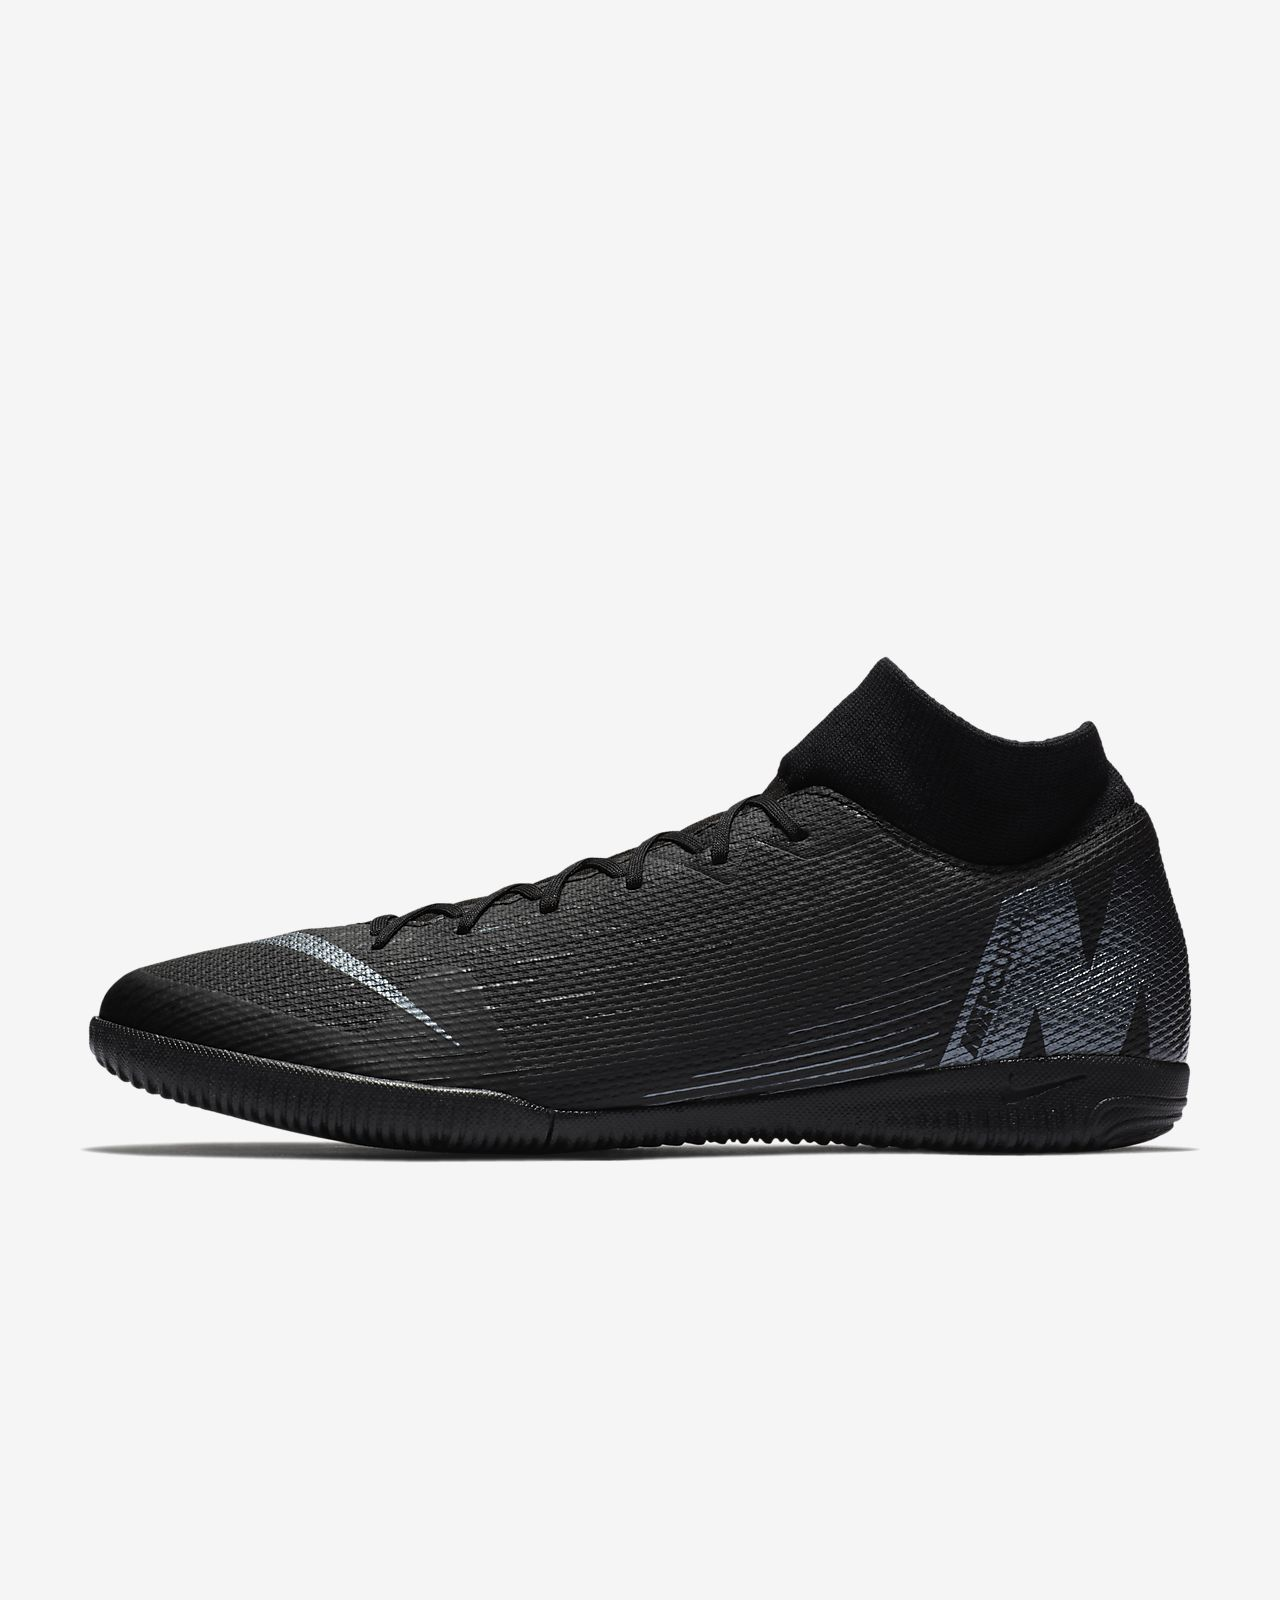 Nike Mercurialx Superfly Vi Academy Ic Indoorcourt Football Shoe